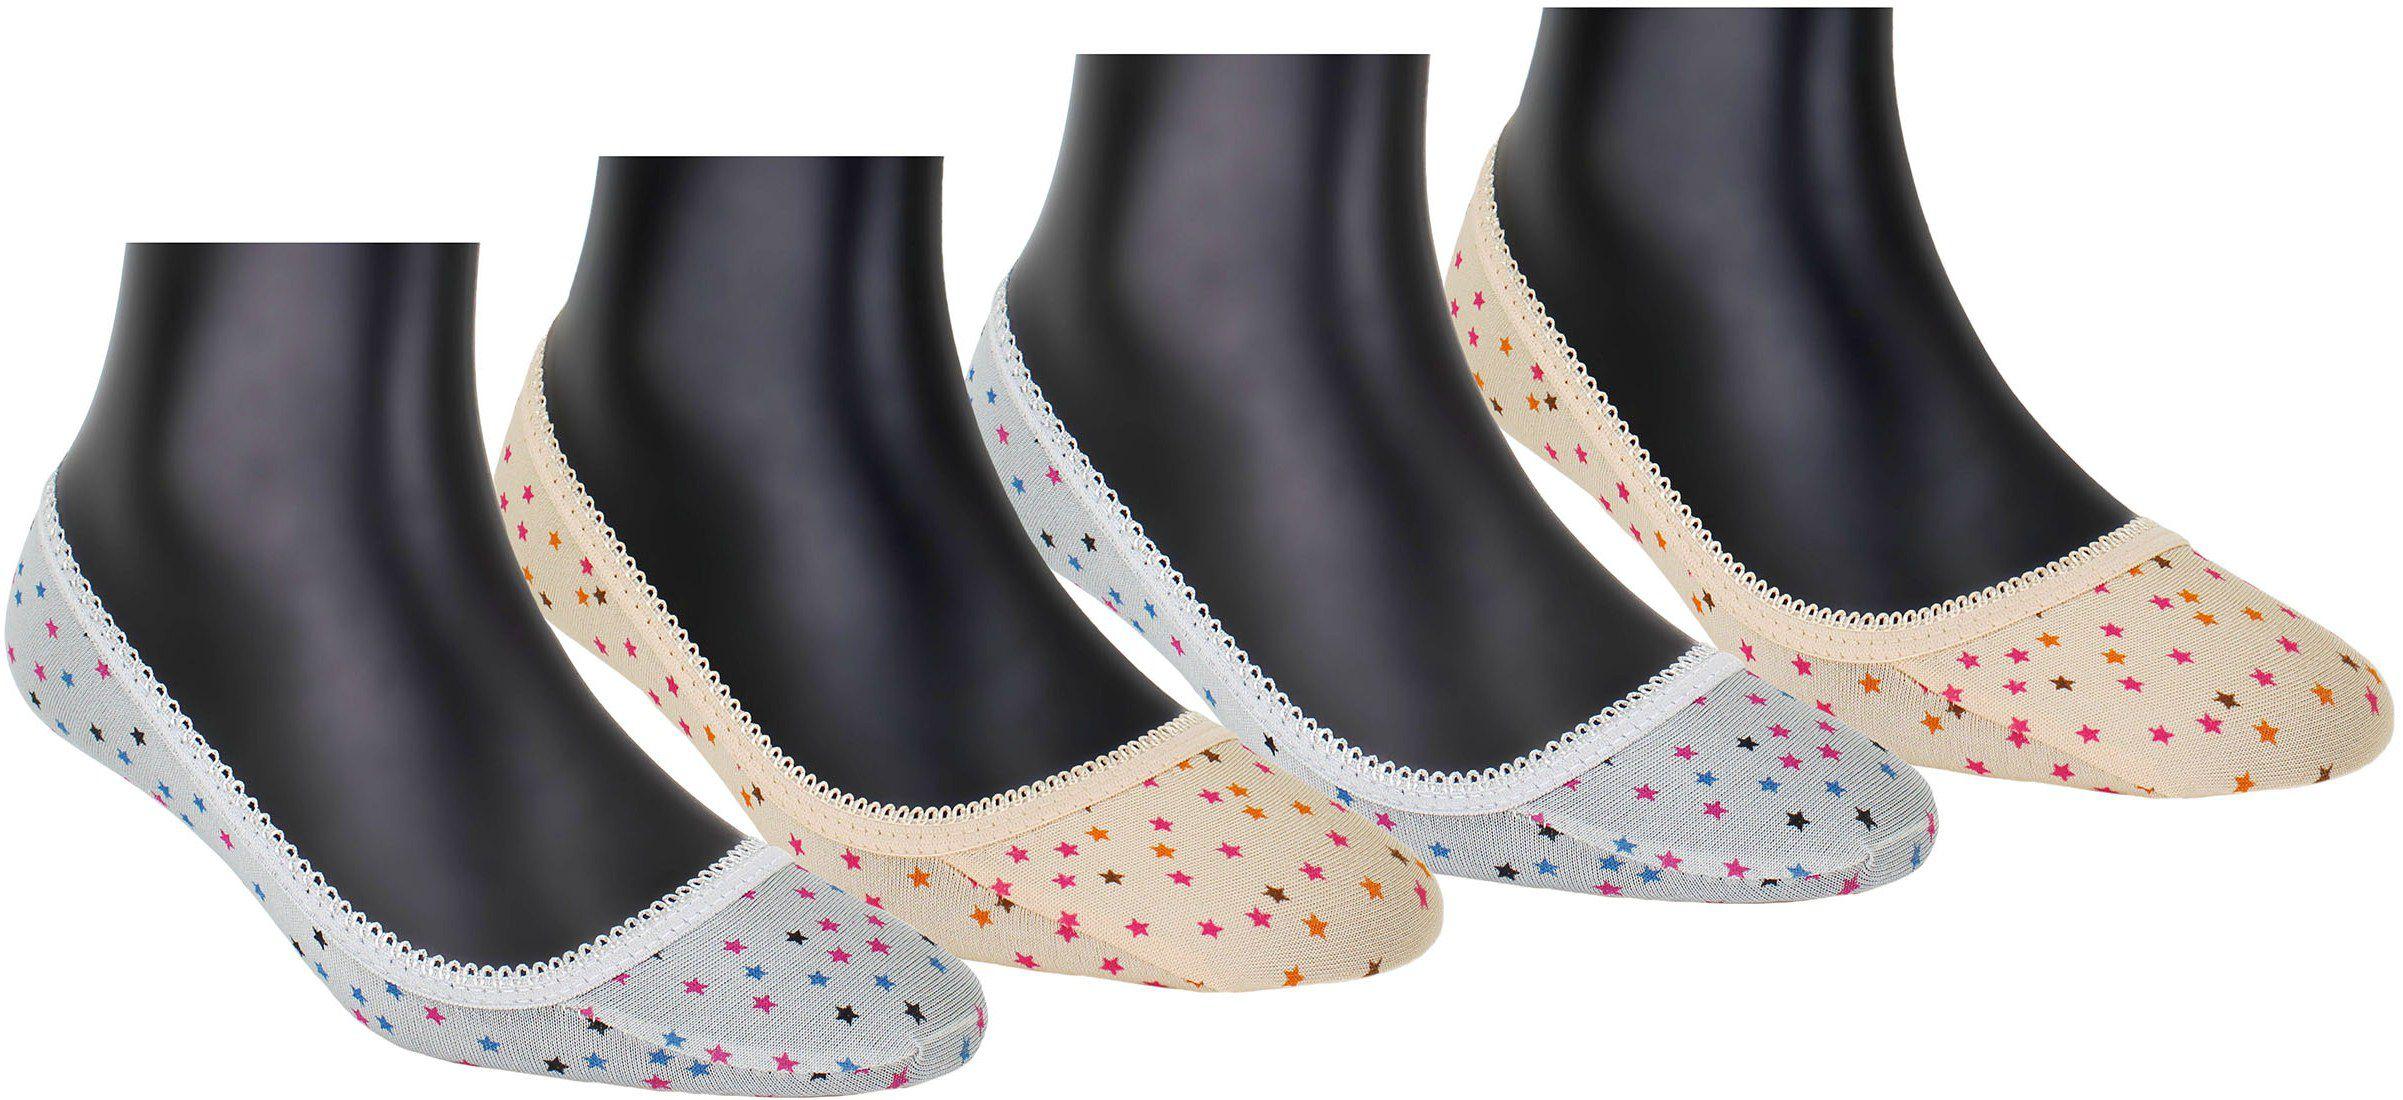 Neska Moda Premium Women's 4 Pair Socks Multicolor Cotton No ShowLoafer Socks With  SiliconGel-S1010